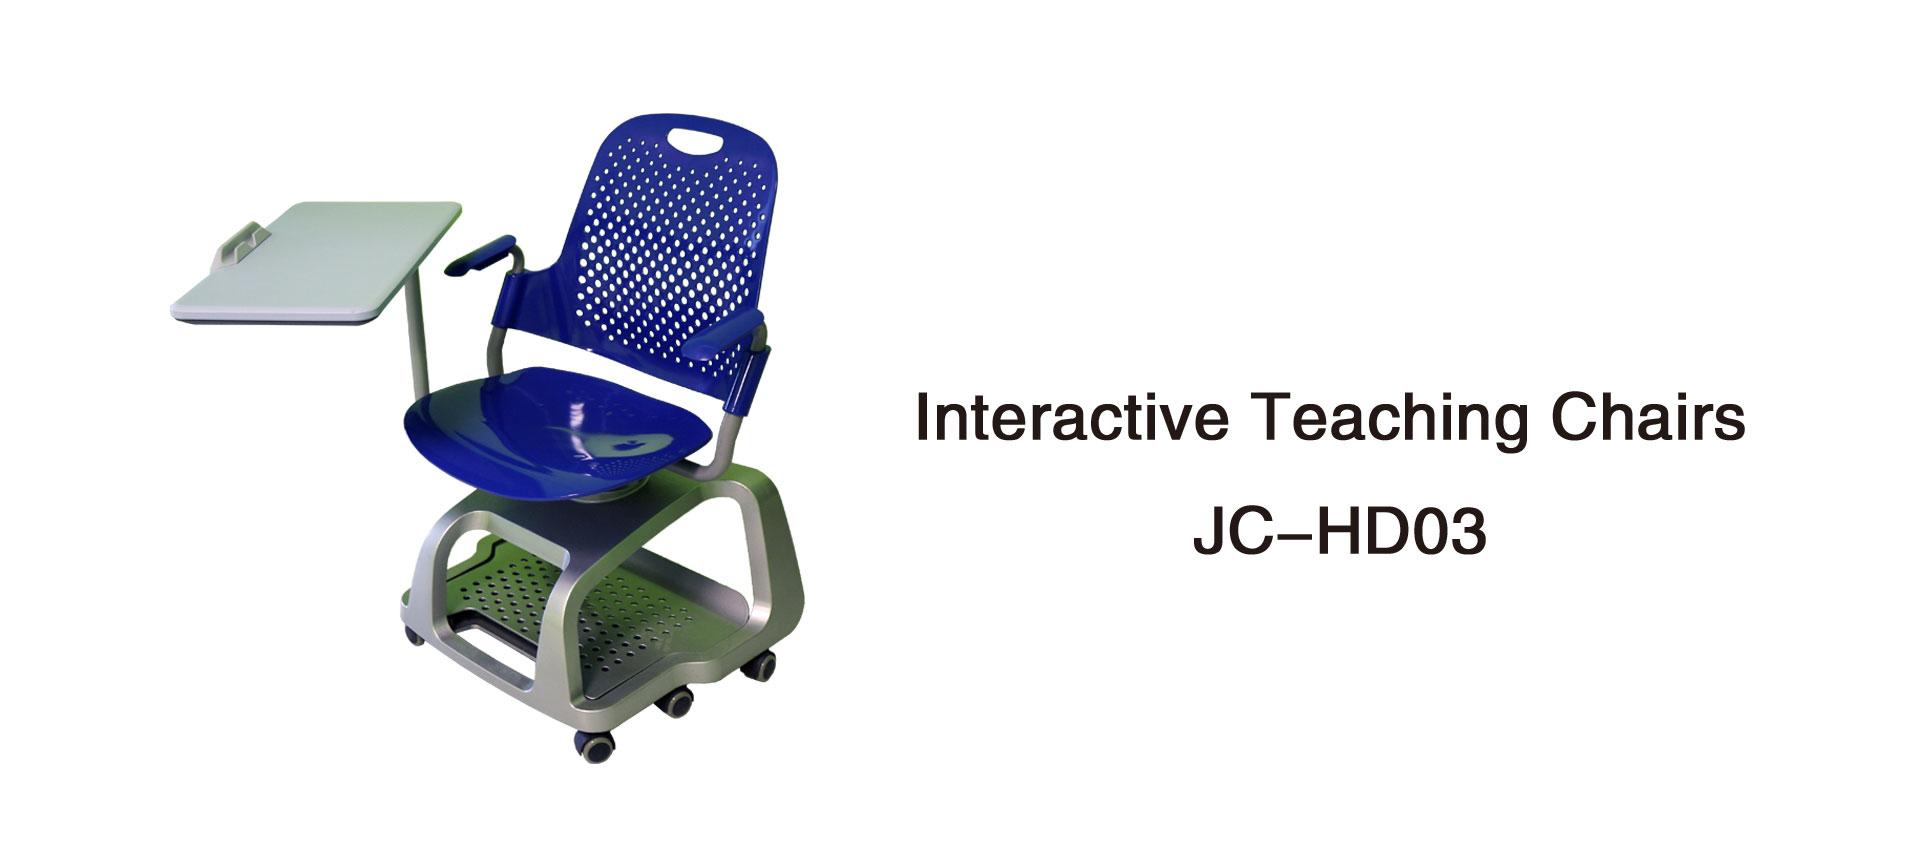 Interactive Teaching Chairs JC-HD03